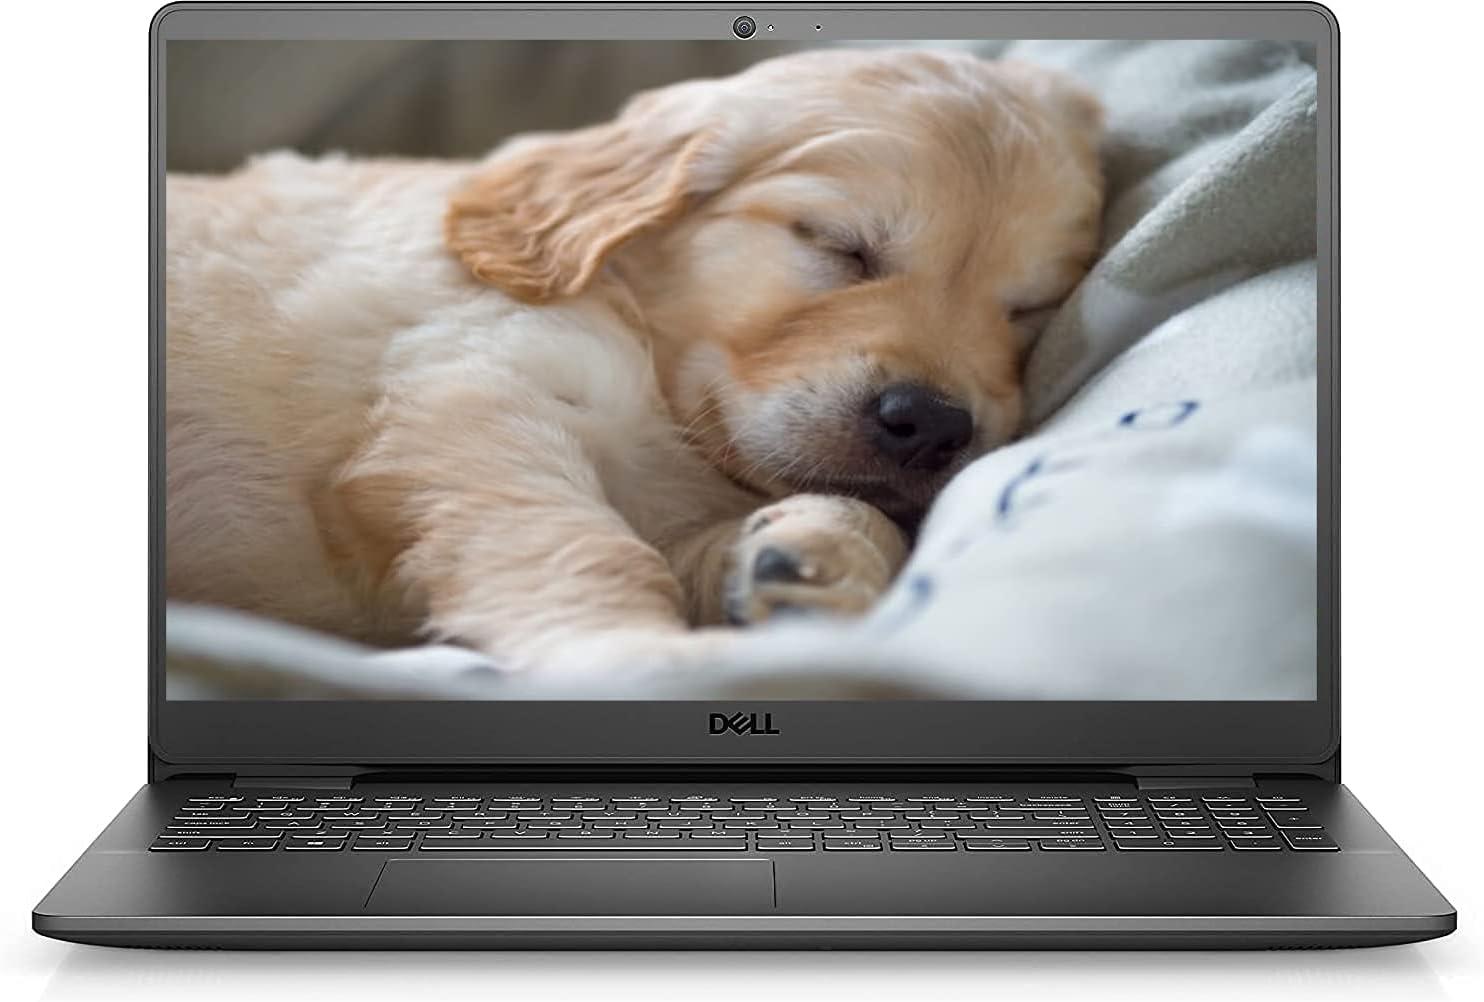 Dell Inspiron 3000 Business Laptop, 15.6 HD Display, Intel Celeron Processor N4020, Windows 10 Pro, 16GB DDR4 RAM, 256GB PCIe SSD, Webcam, Bluetooth, HDMI, SD Card Reader